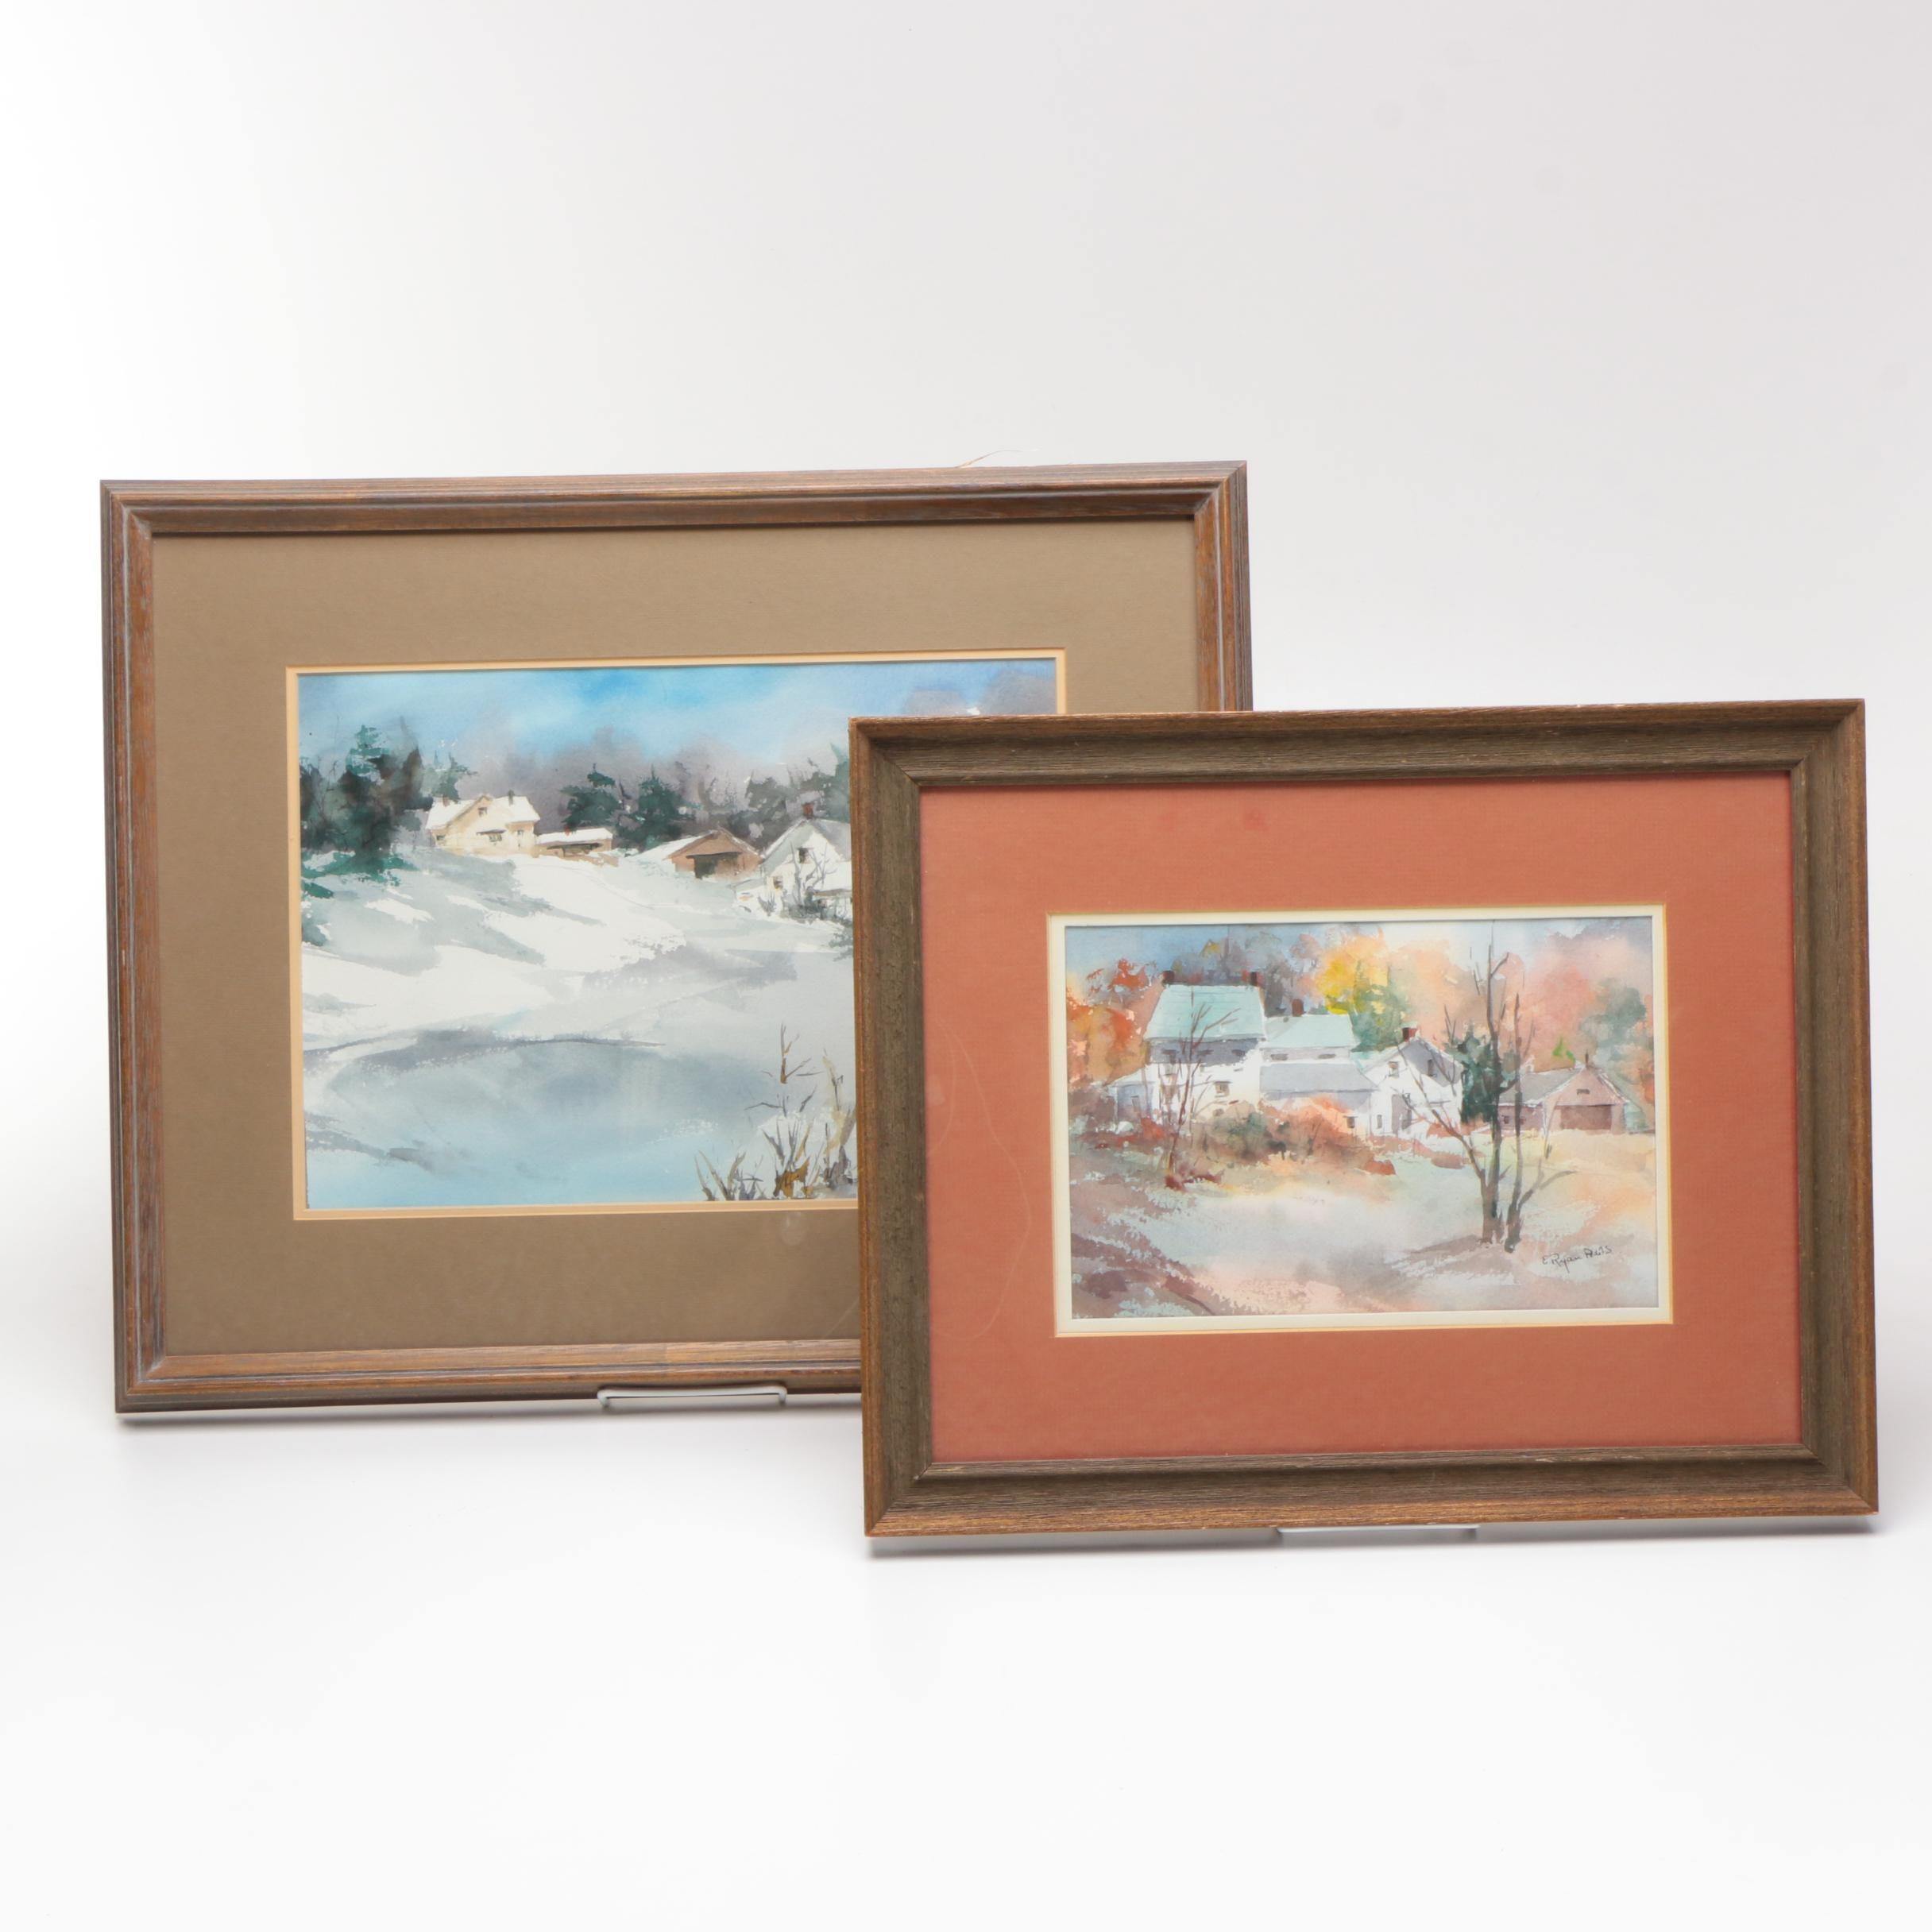 E. Ryan Watercolors of Winter Landscapes